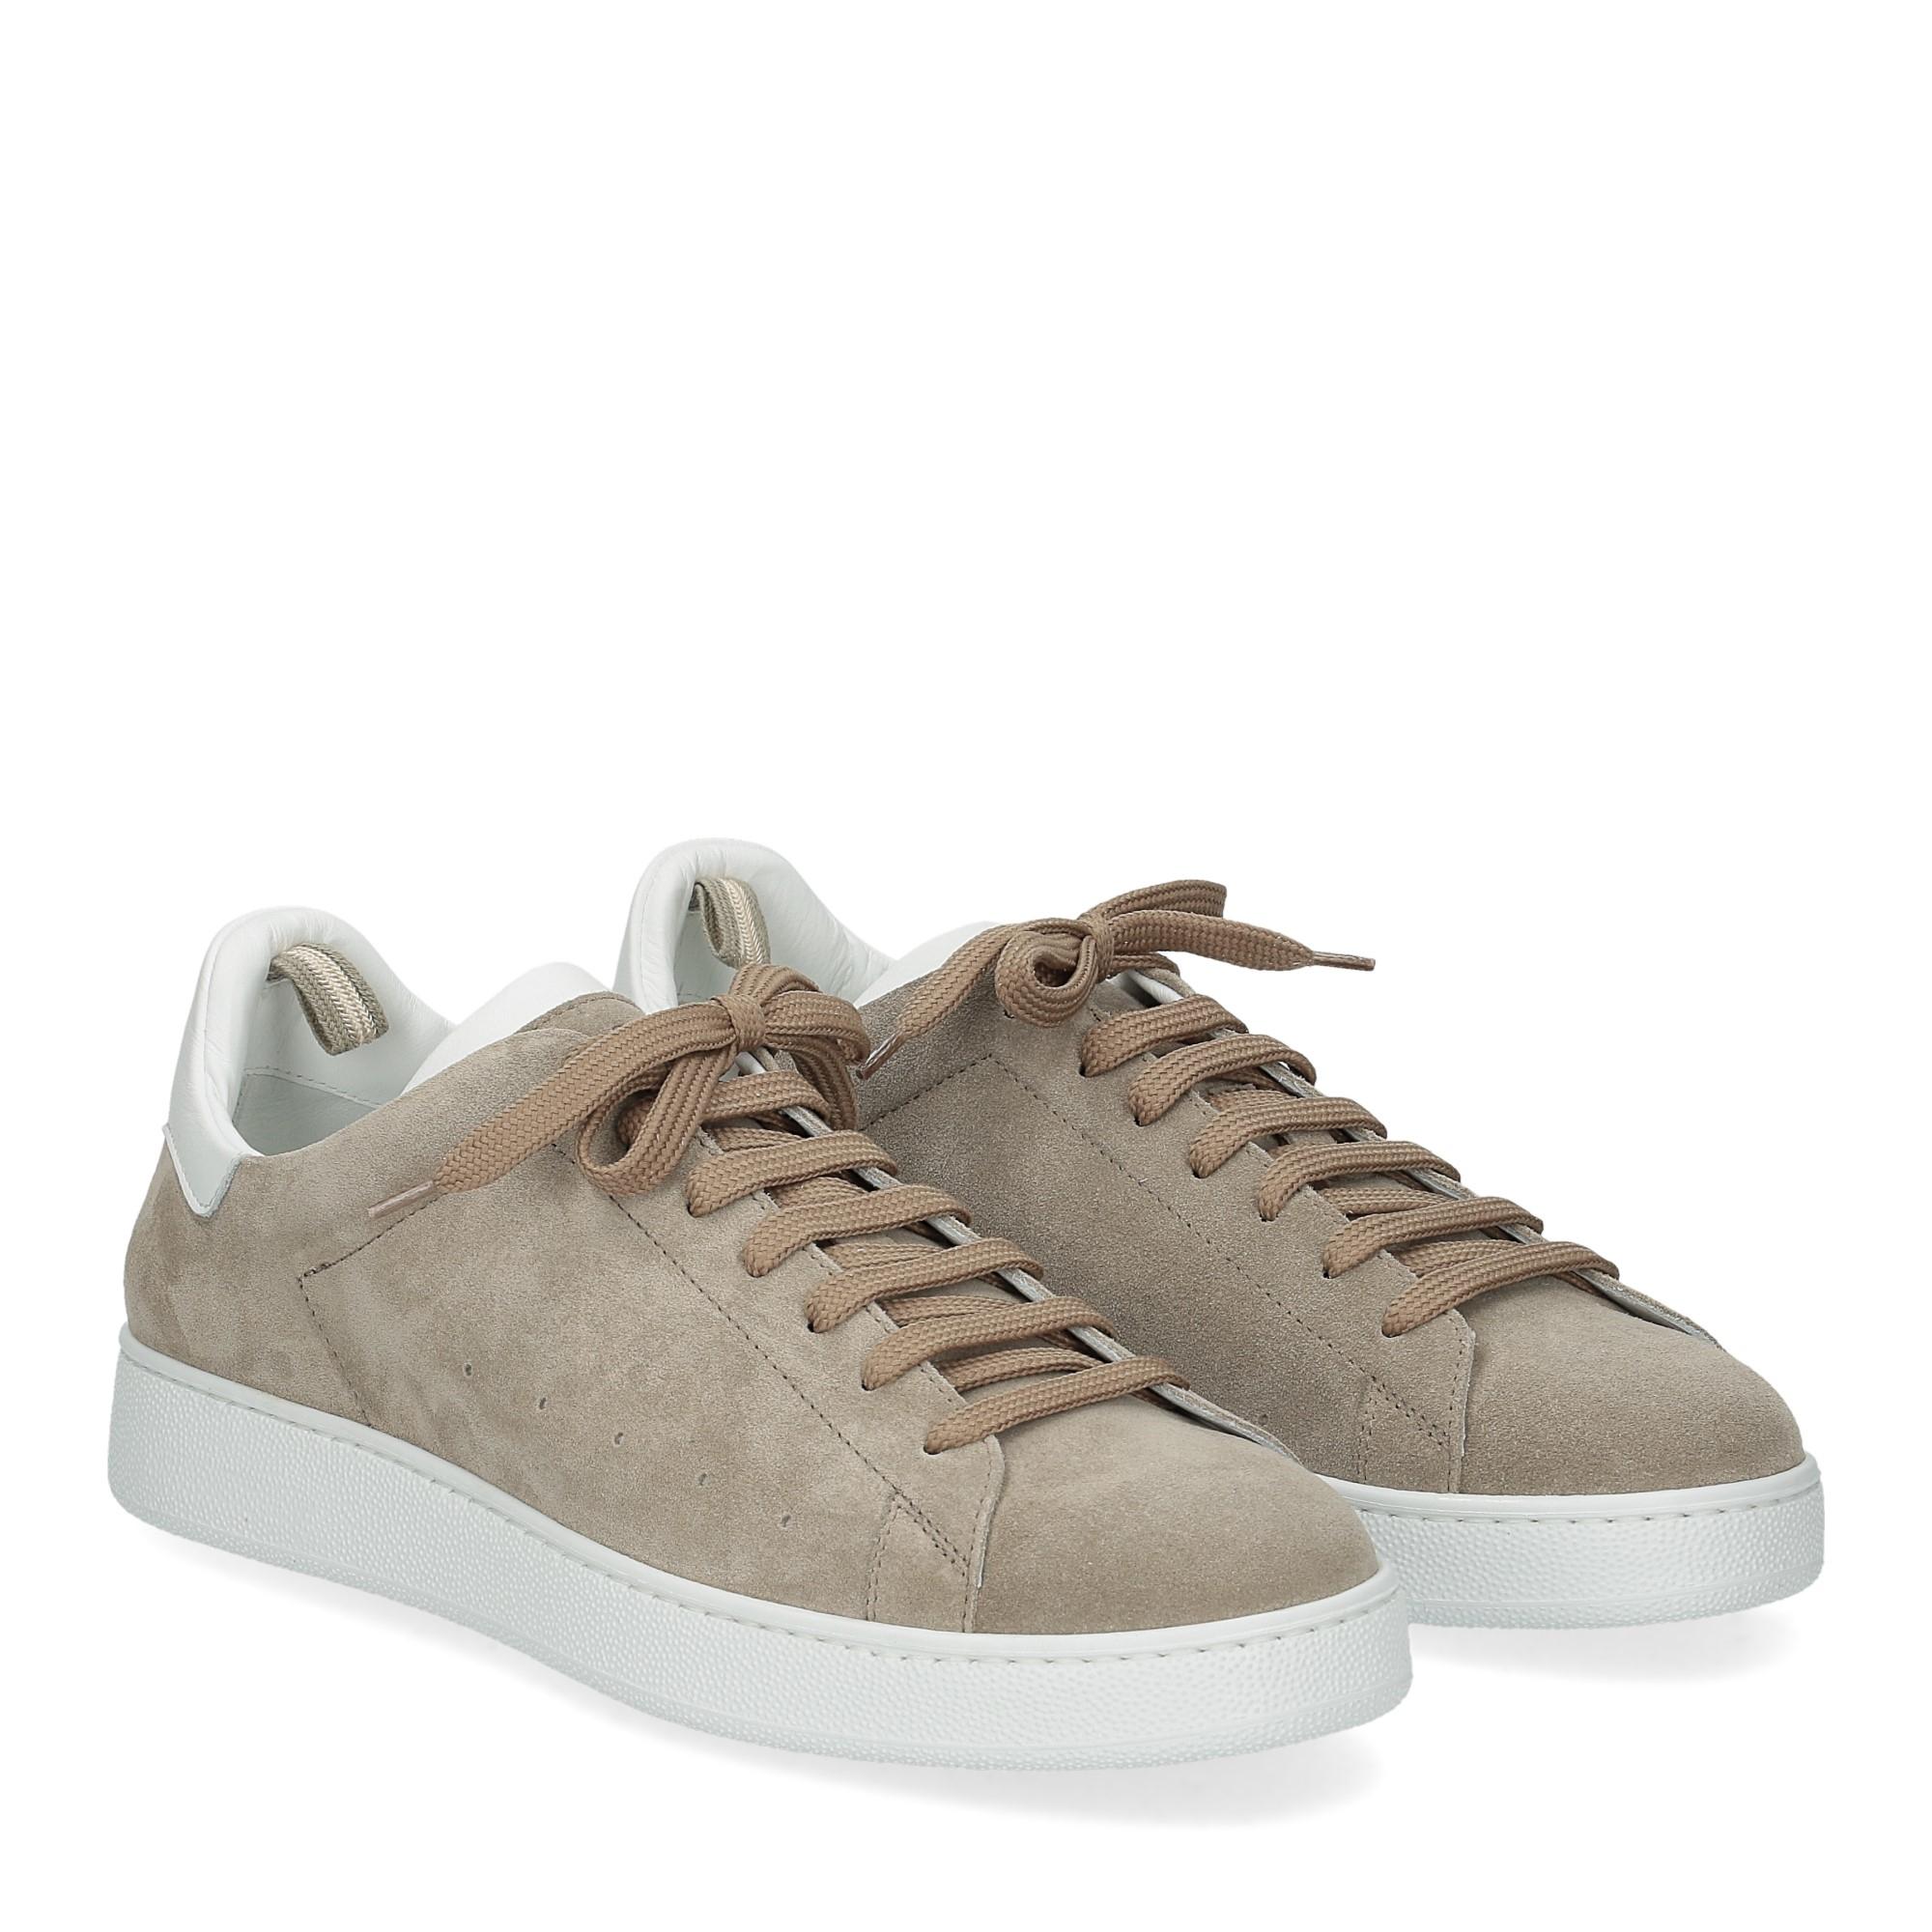 Officine Creative sneaker antilope taupe